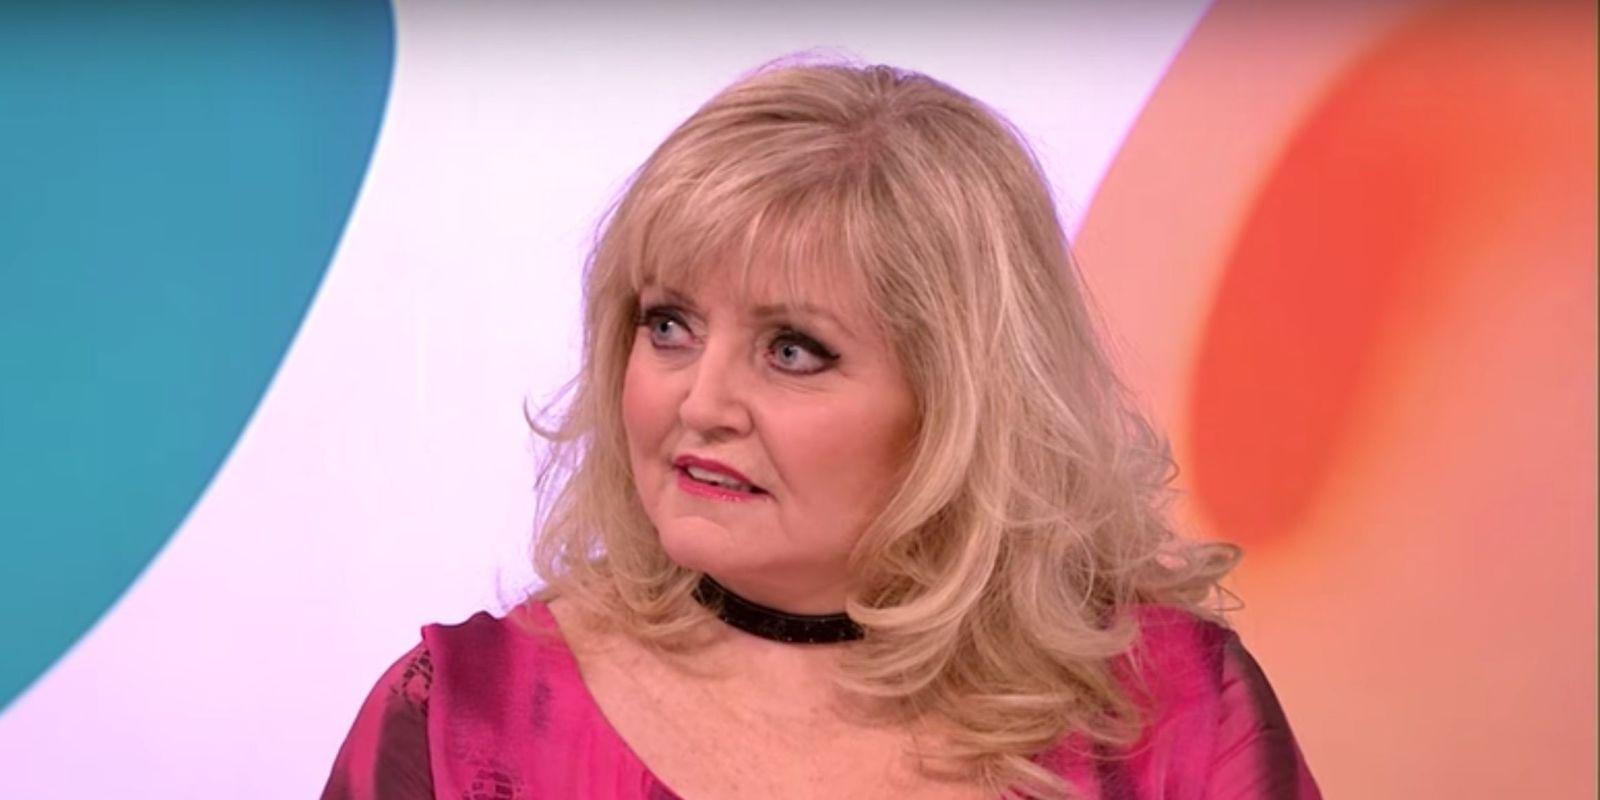 Linda Nolan to host NHS 70th anniversary concert at Pictures of linda nolan